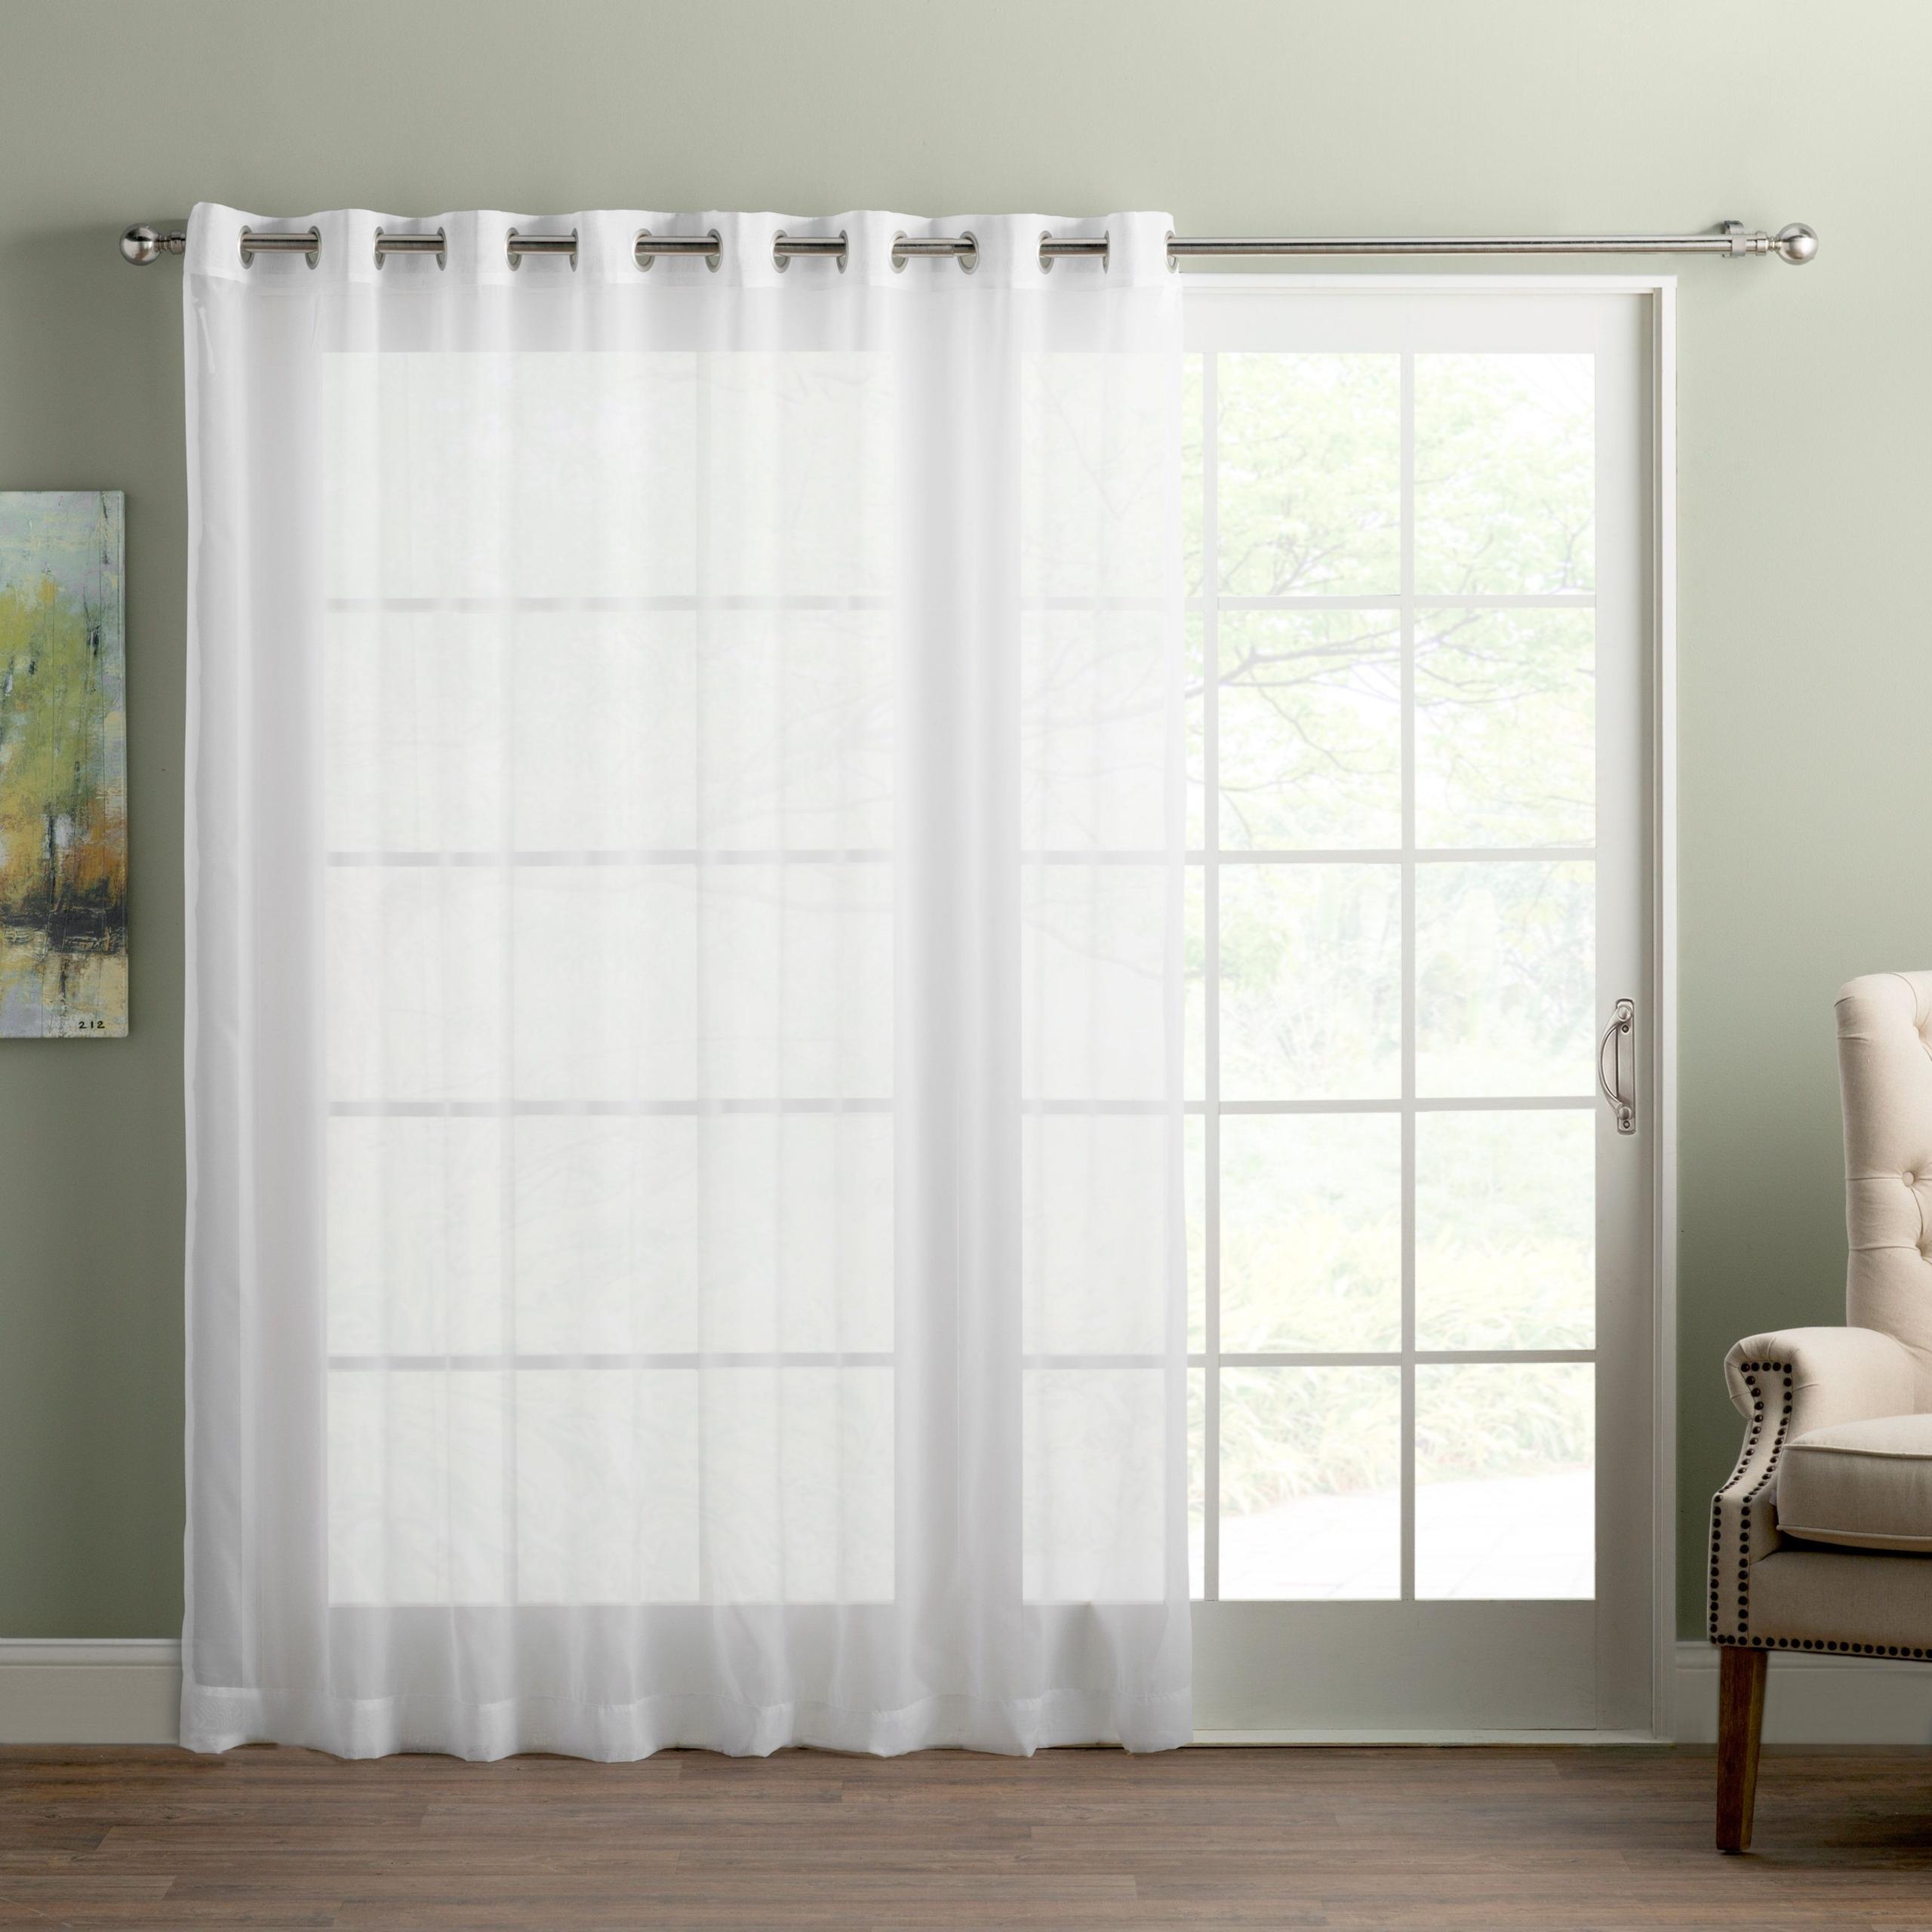 sliding curtains